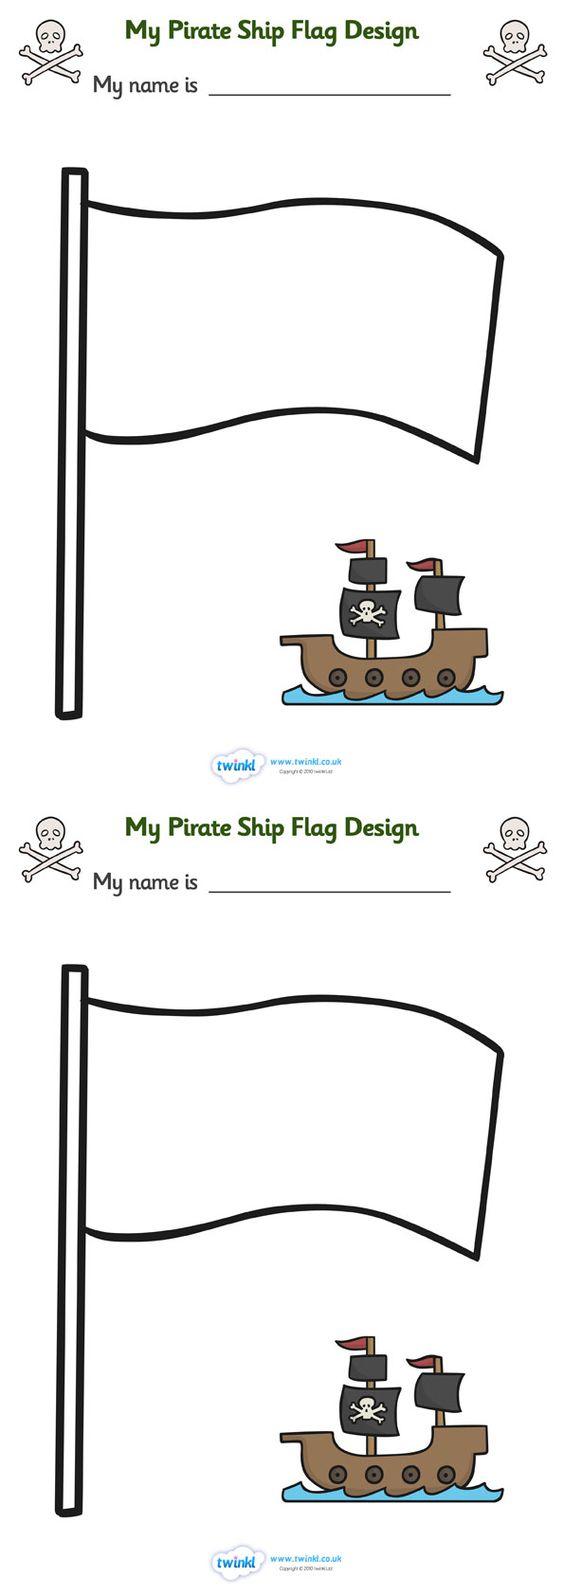 Twinkl Resources Gt Gt Design Your Own Ship Flag Worksheet